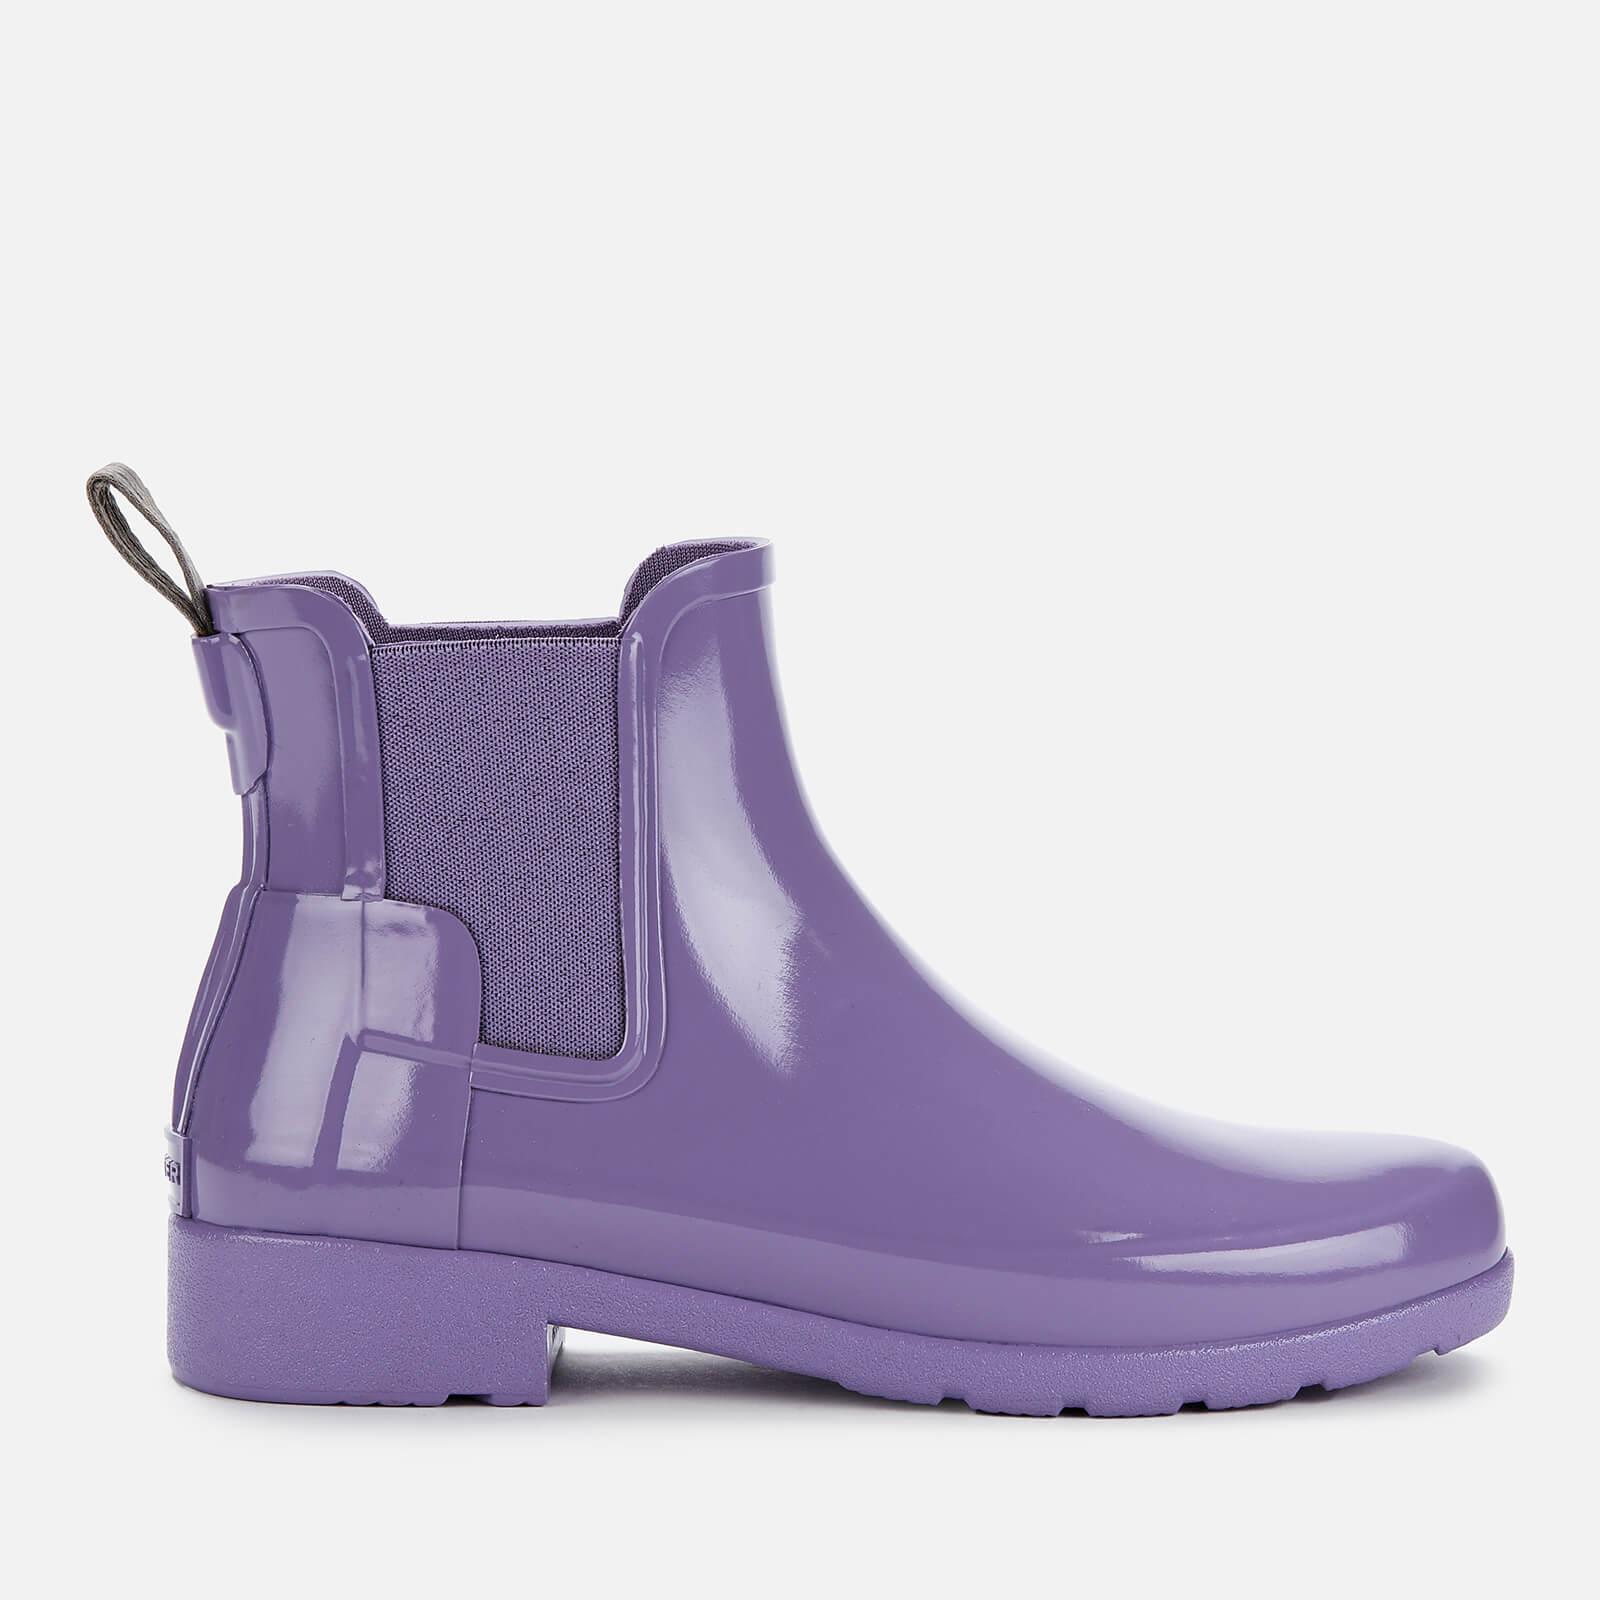 Hunter Women's Original Refined Gloss Chelsea Boots - Parma Violet - UK 6 - Purple